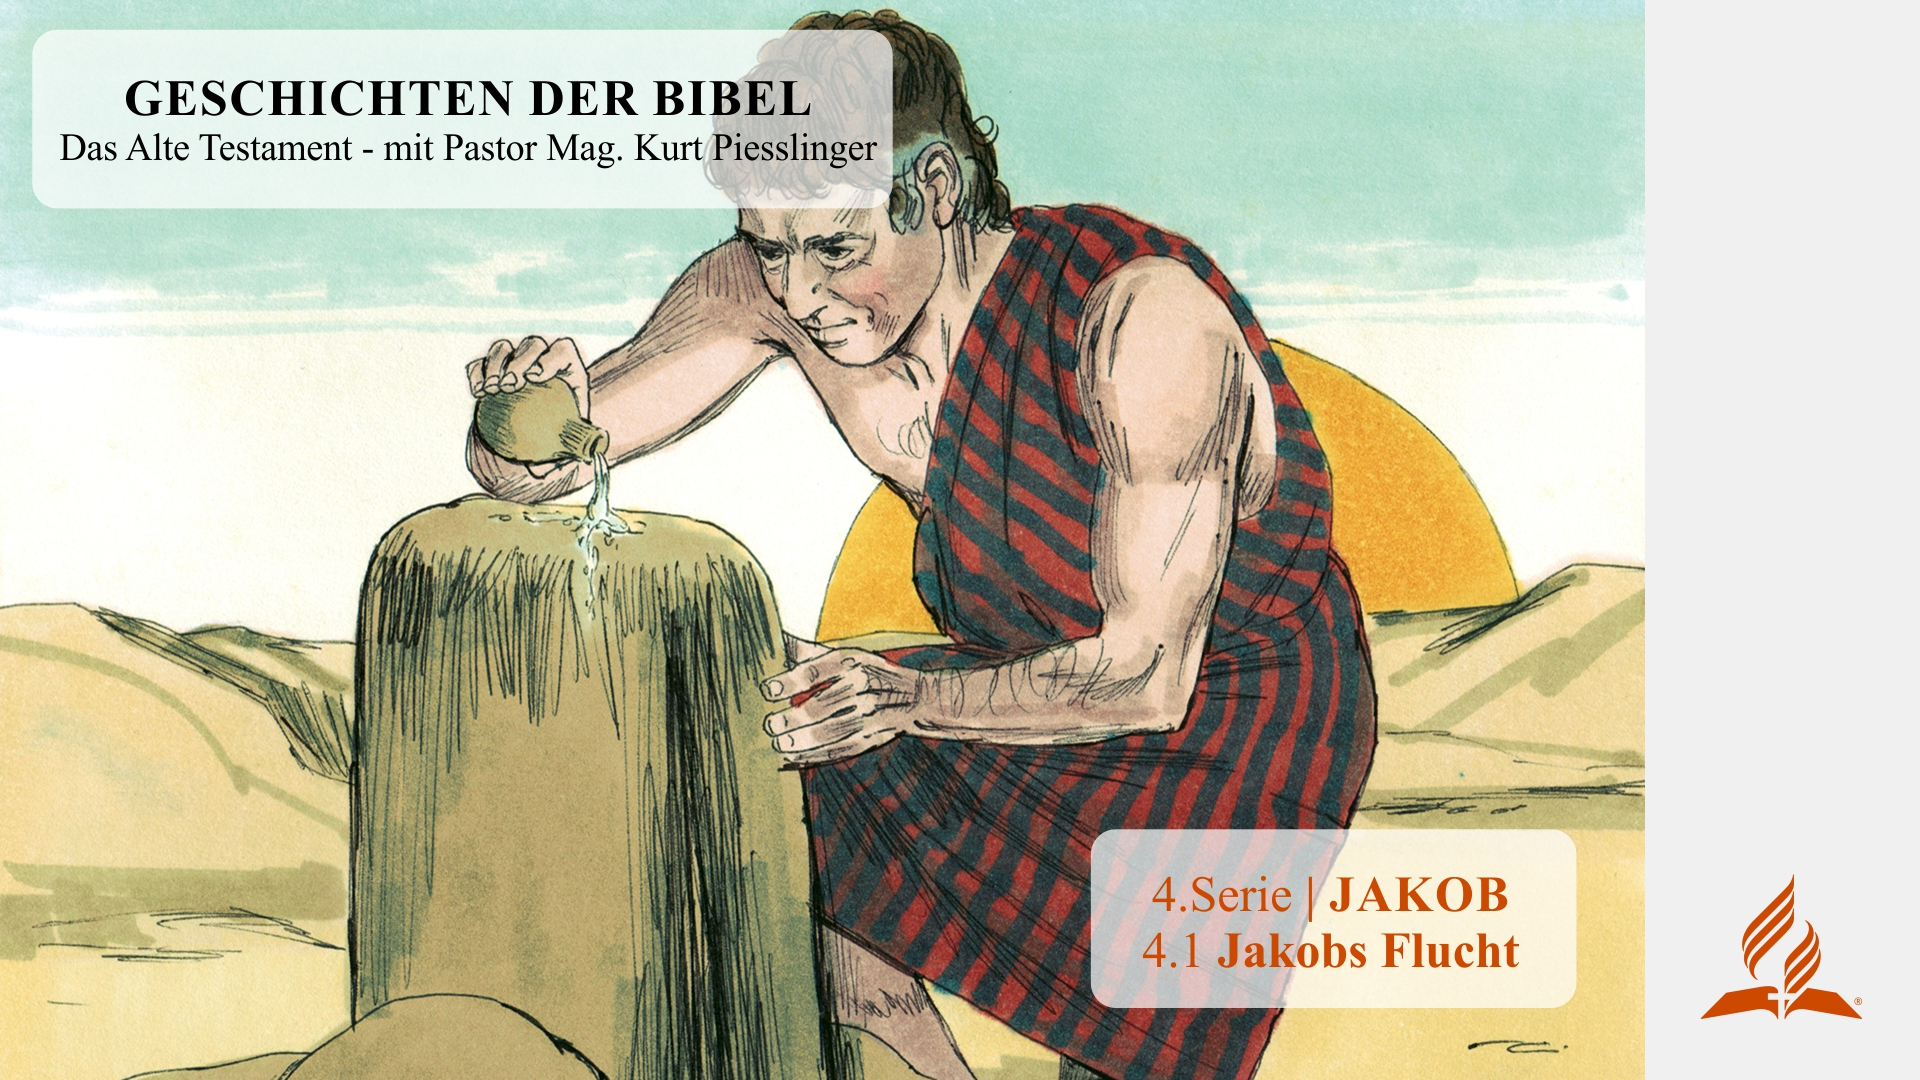 4.1 Jakobs Flucht x